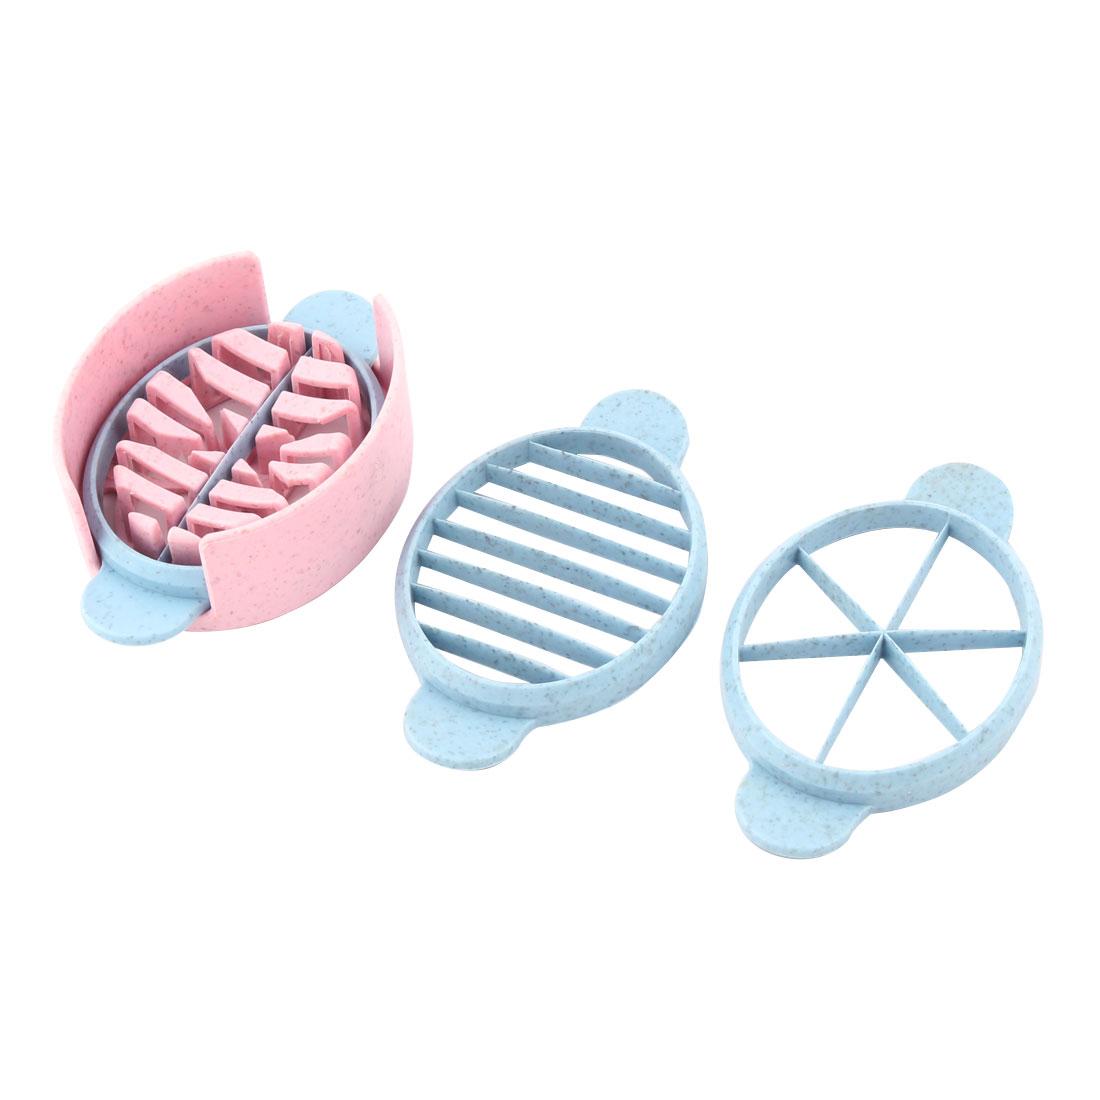 Home Plastic Three Ways Fruit Egg DIY Wedge Slicer Cutter Tool Pink Blue Set